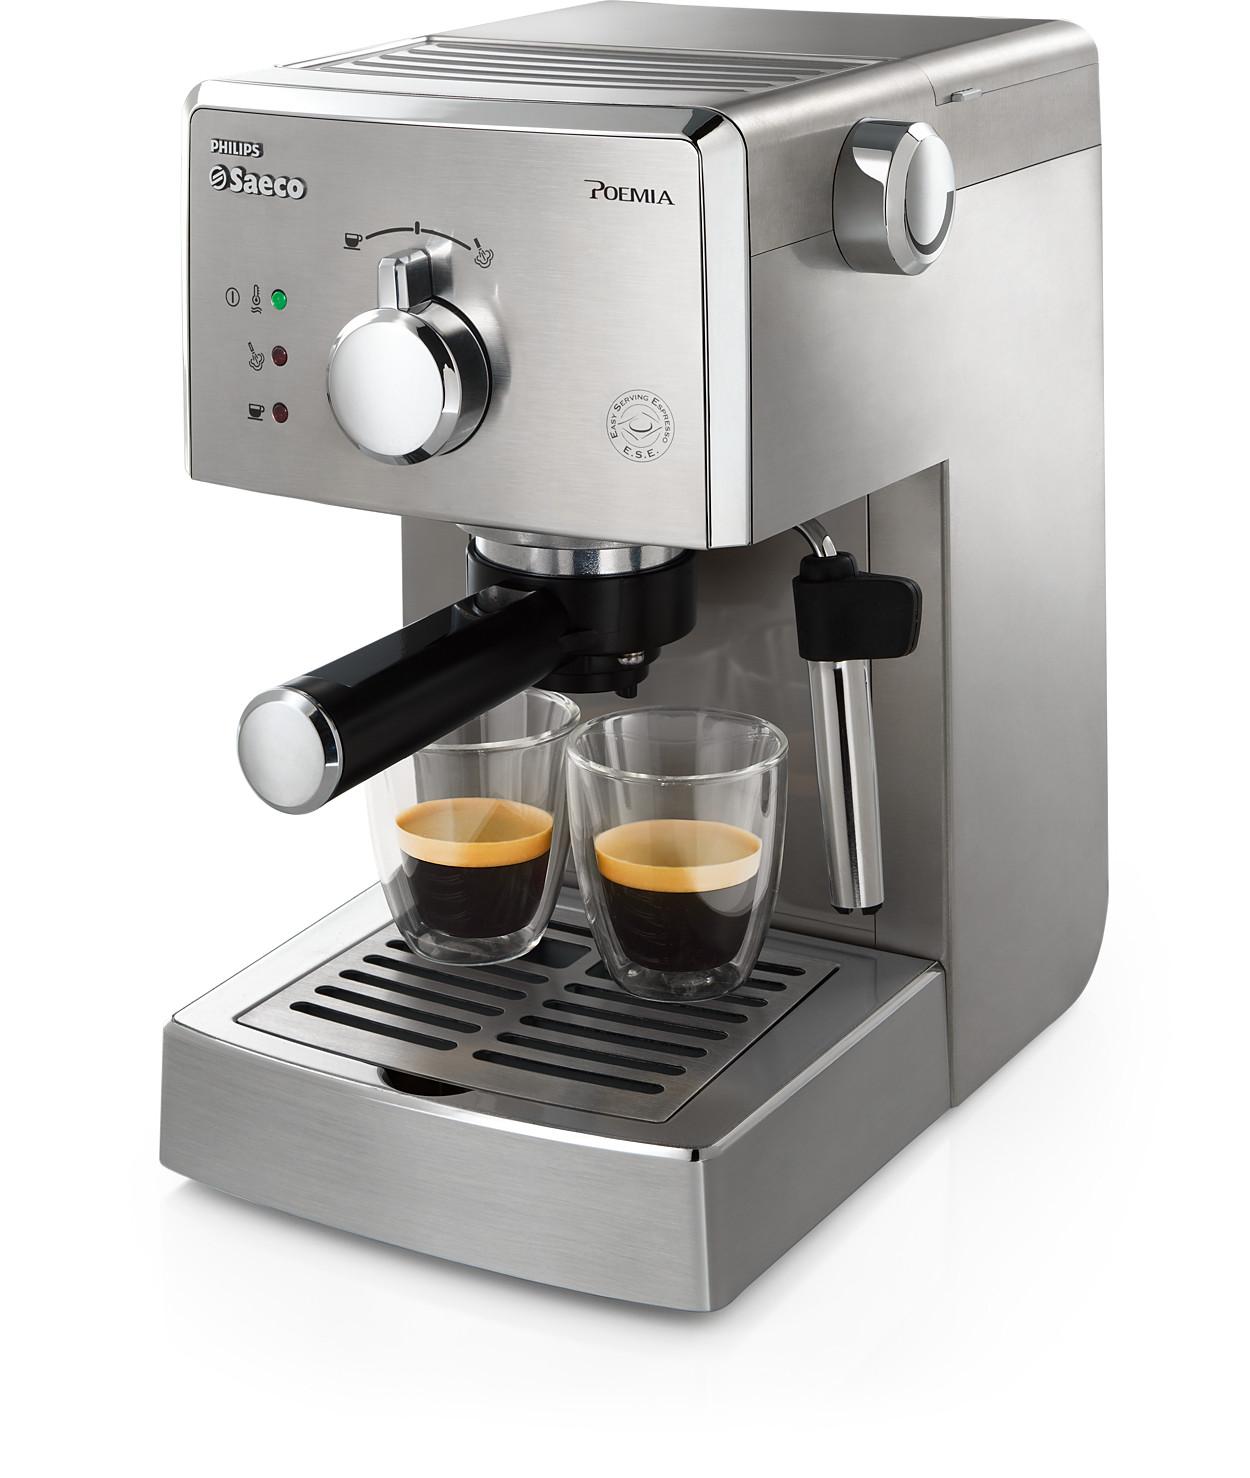 Acheter le saeco poemia machine espresso manuelle hd8327 91 - Acheter une machine a cafe ...